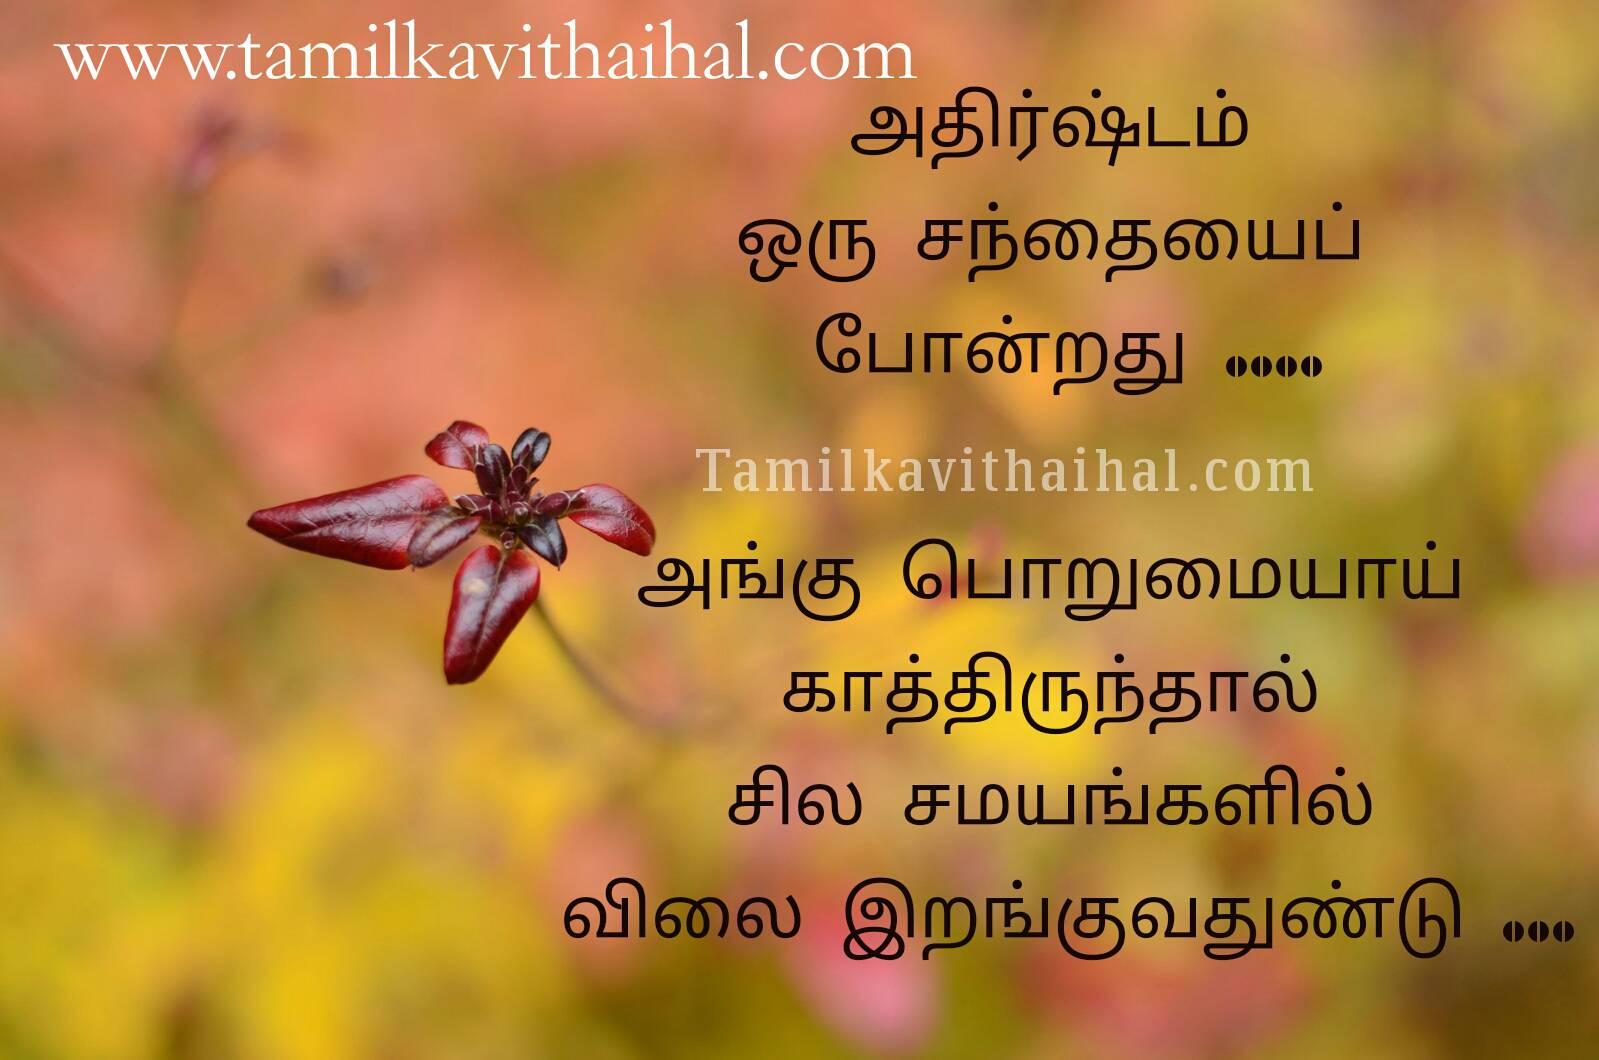 Famous lucky quotes in tamil font porumai vilai santhai athirshdam thathuvam kavithai whatsapp status image